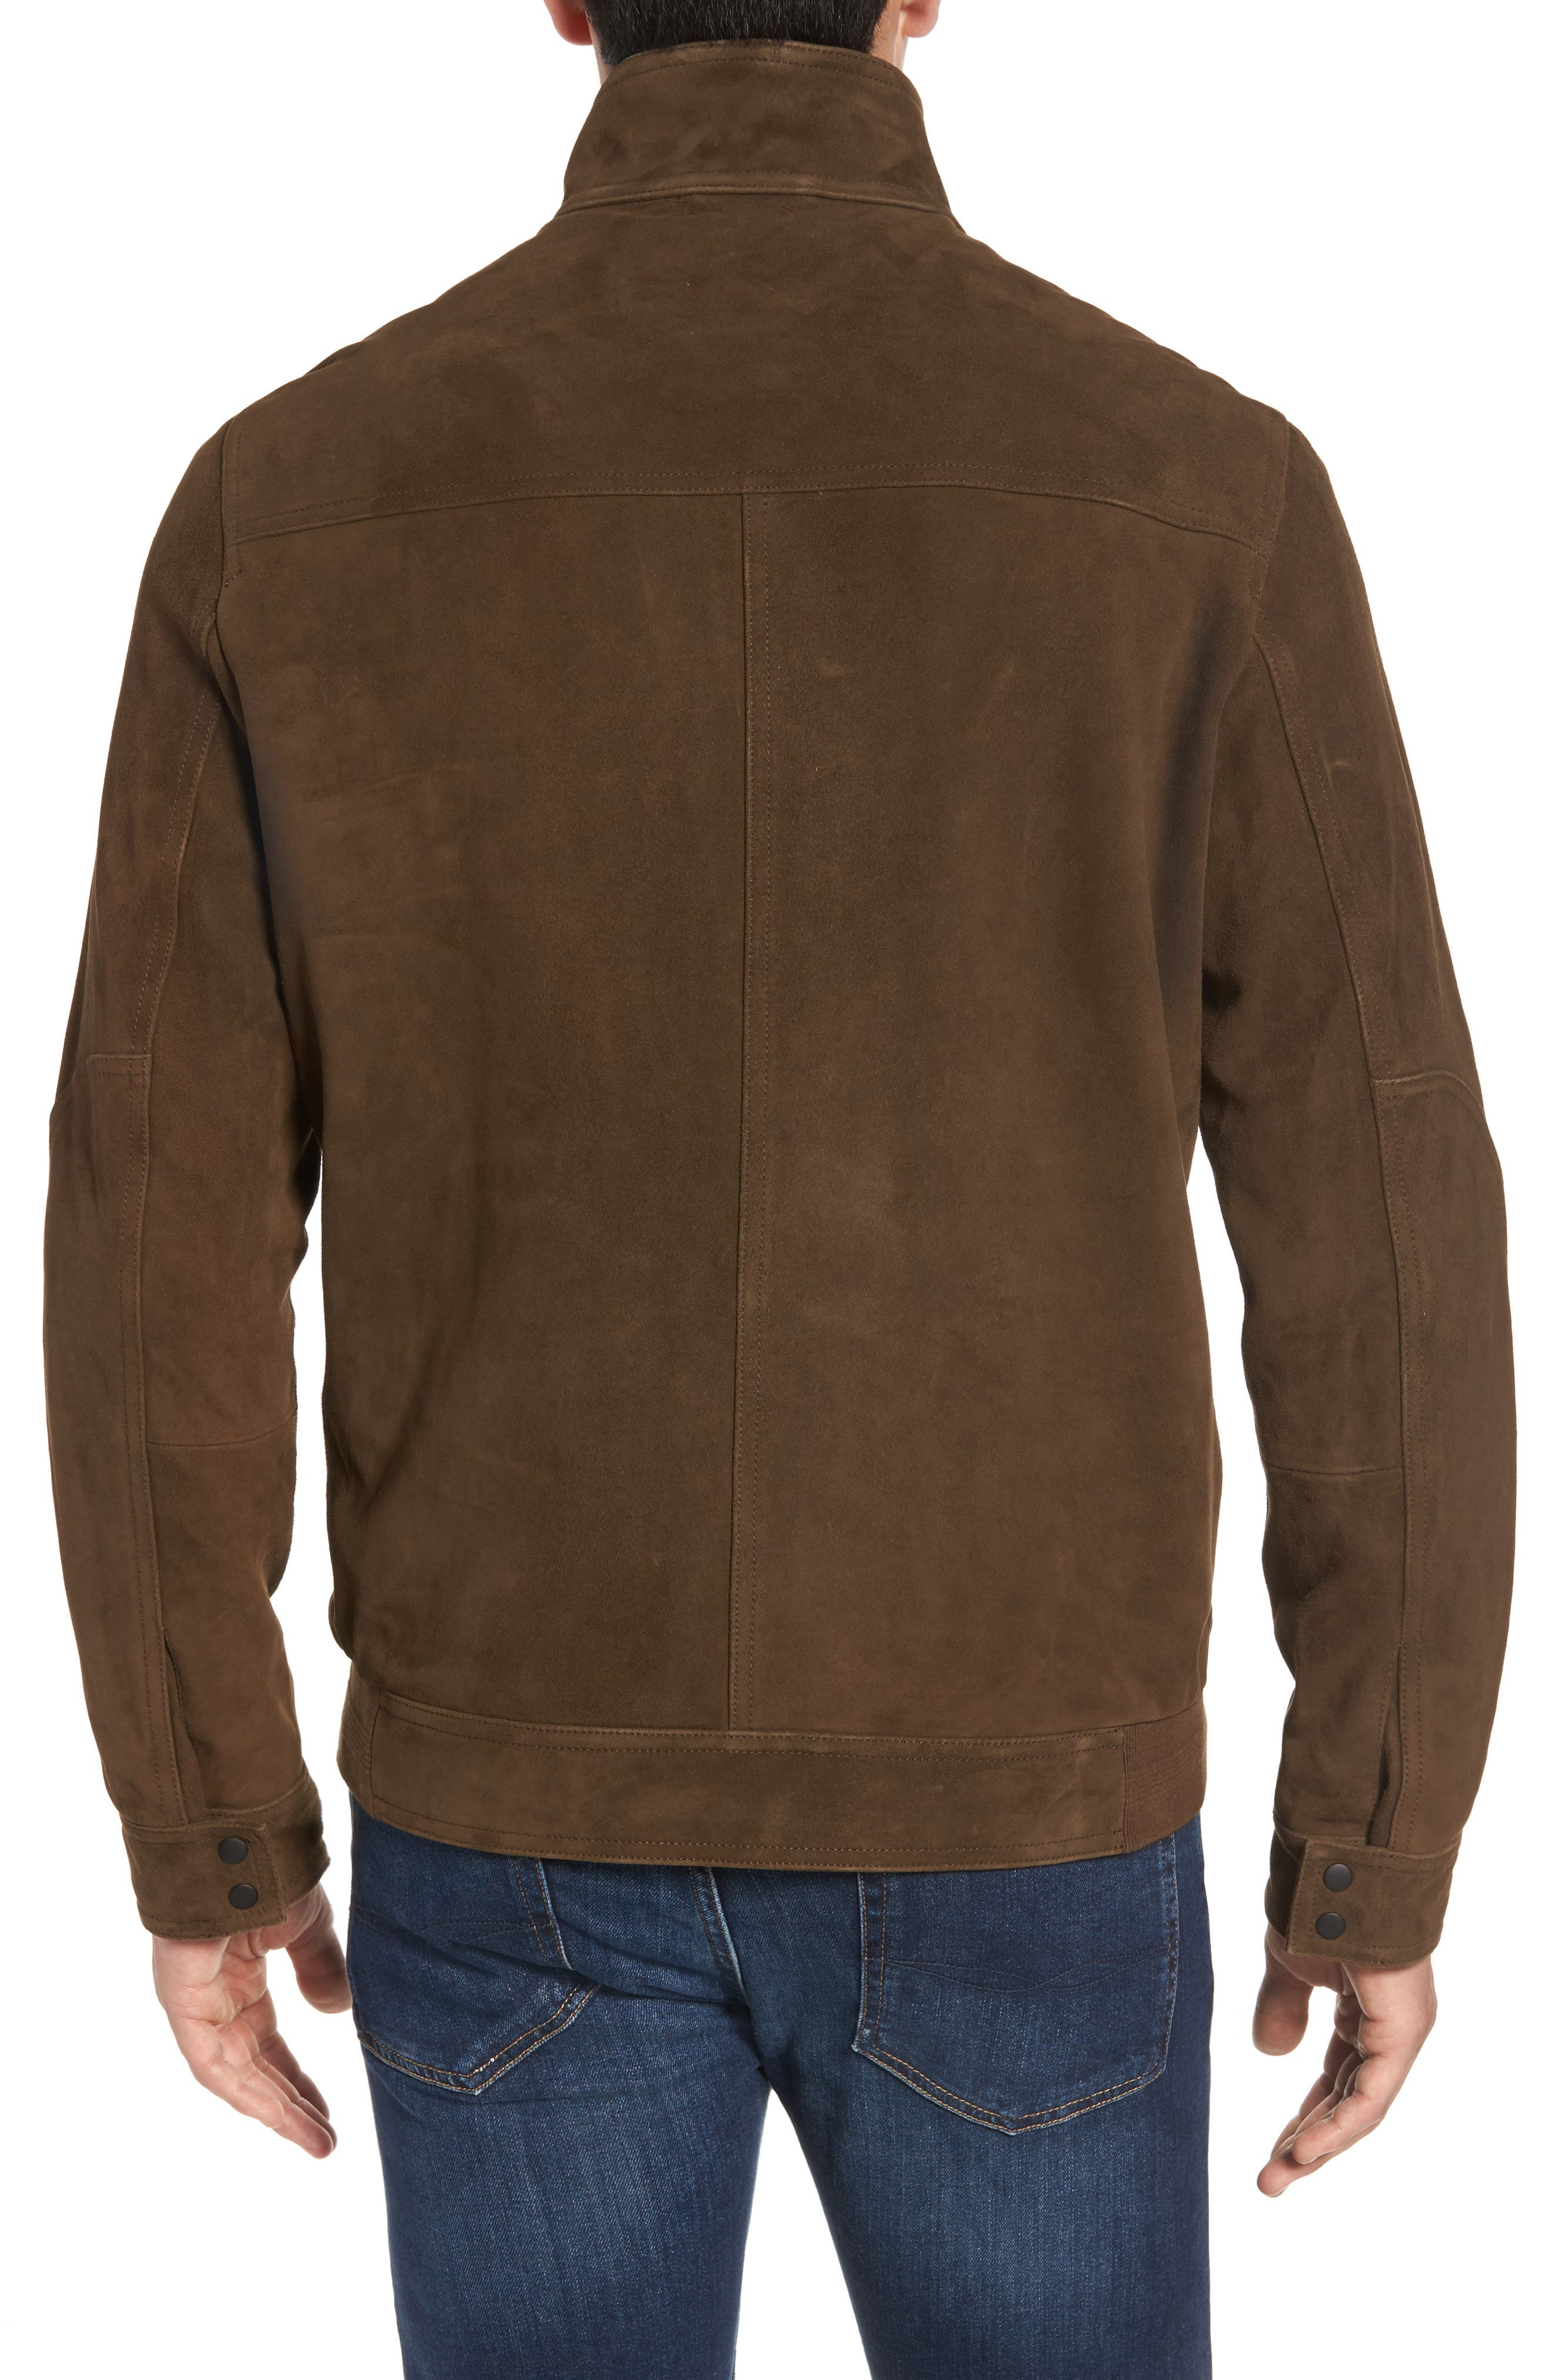 Alternate Image 2  - Rodd & Gunn Avondale Suede Jacket